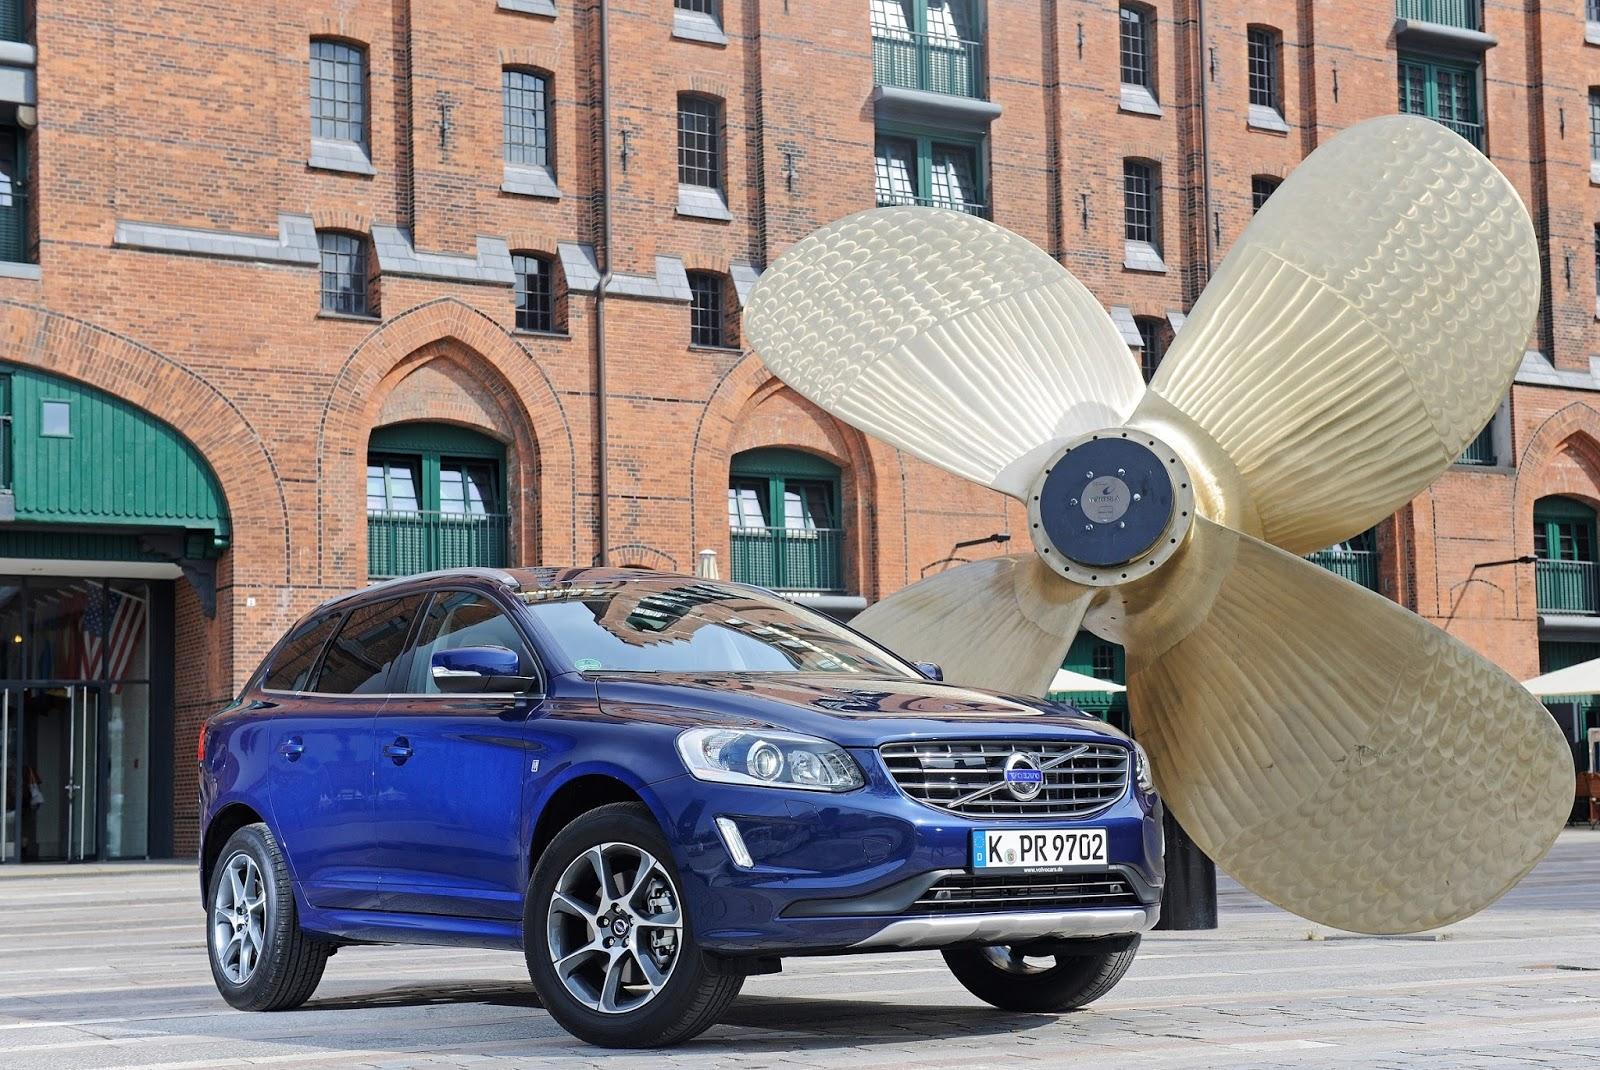 VOLVO%2BXC60 Ρεκόρ πωλήσεων για τη Volvo στην Ελλάδα και το 2015 Sales, Volvo, Volvo V40 Cross Country, Volvo XC60, Volvo XC90